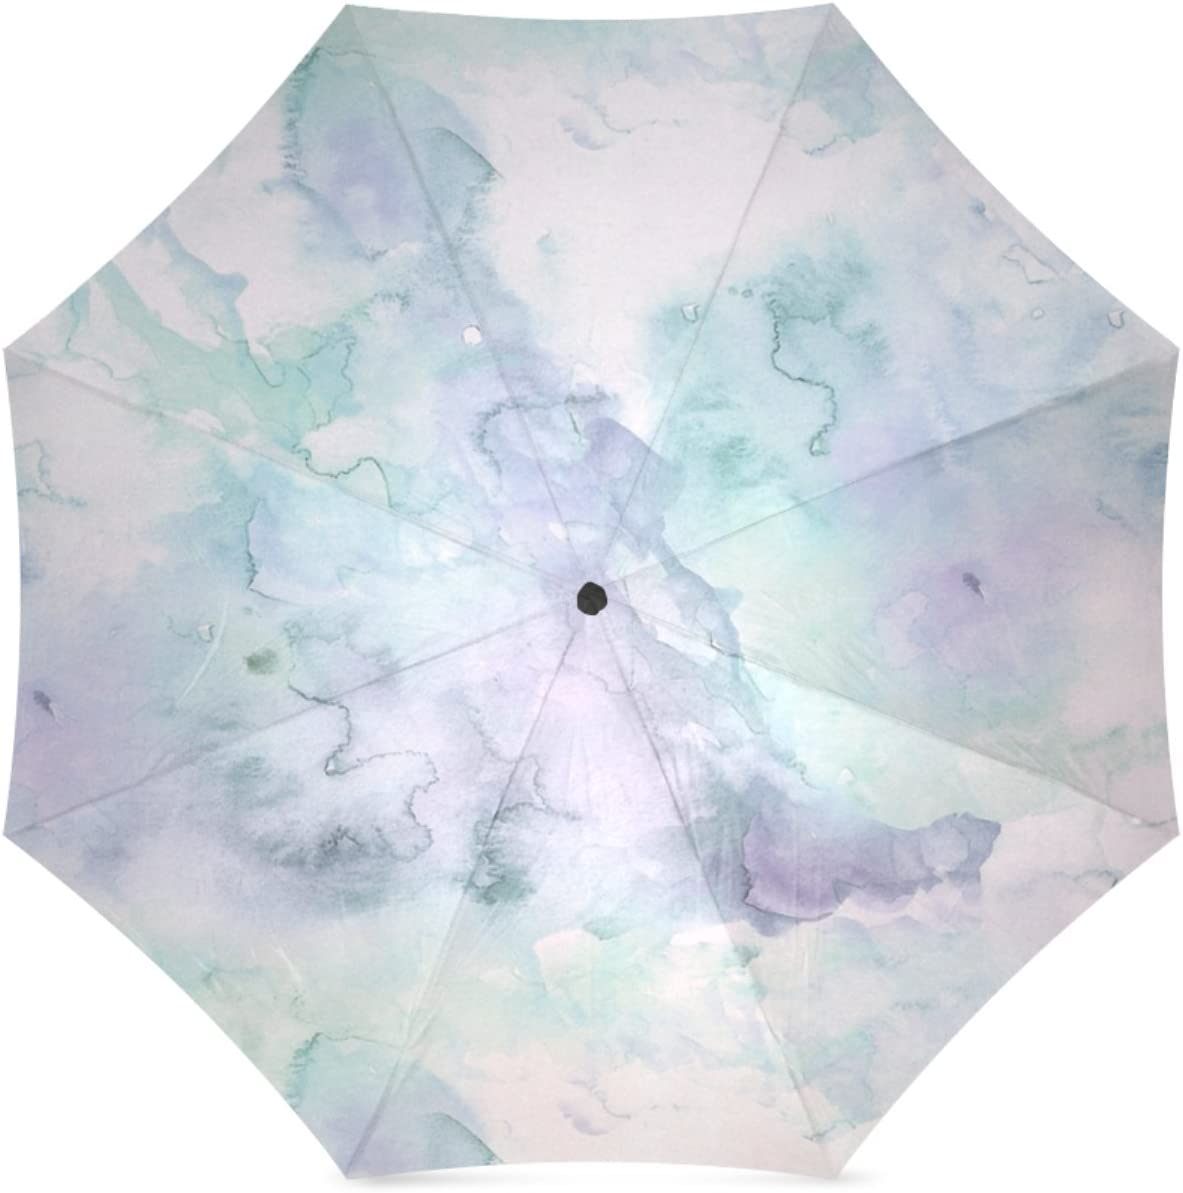 Personalized Lavender Hand Painted Foldable Umbrella Rain Compact Travel Umbrella